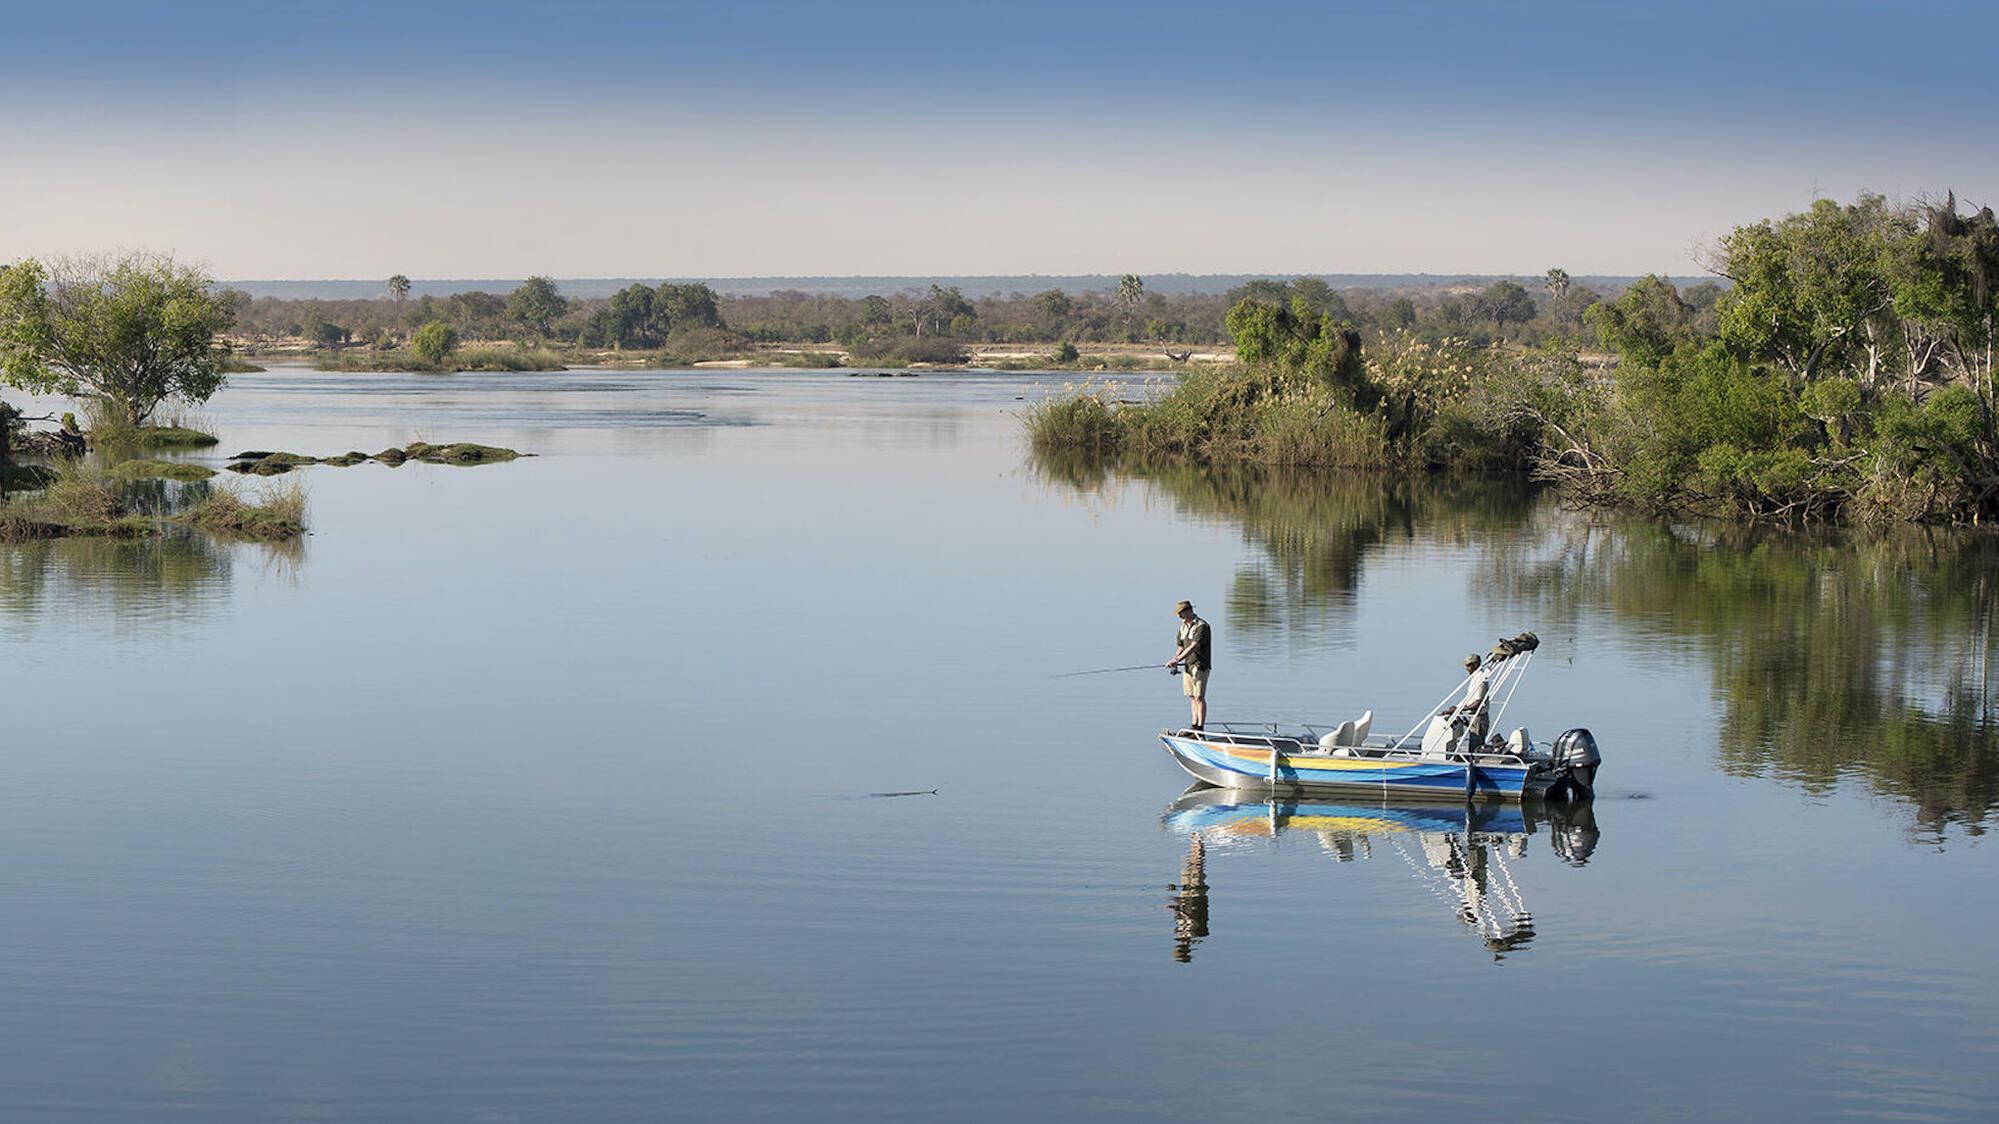 Border Jumper's Arm, Leg Missing After Boat Capsizes Along The Zambezi